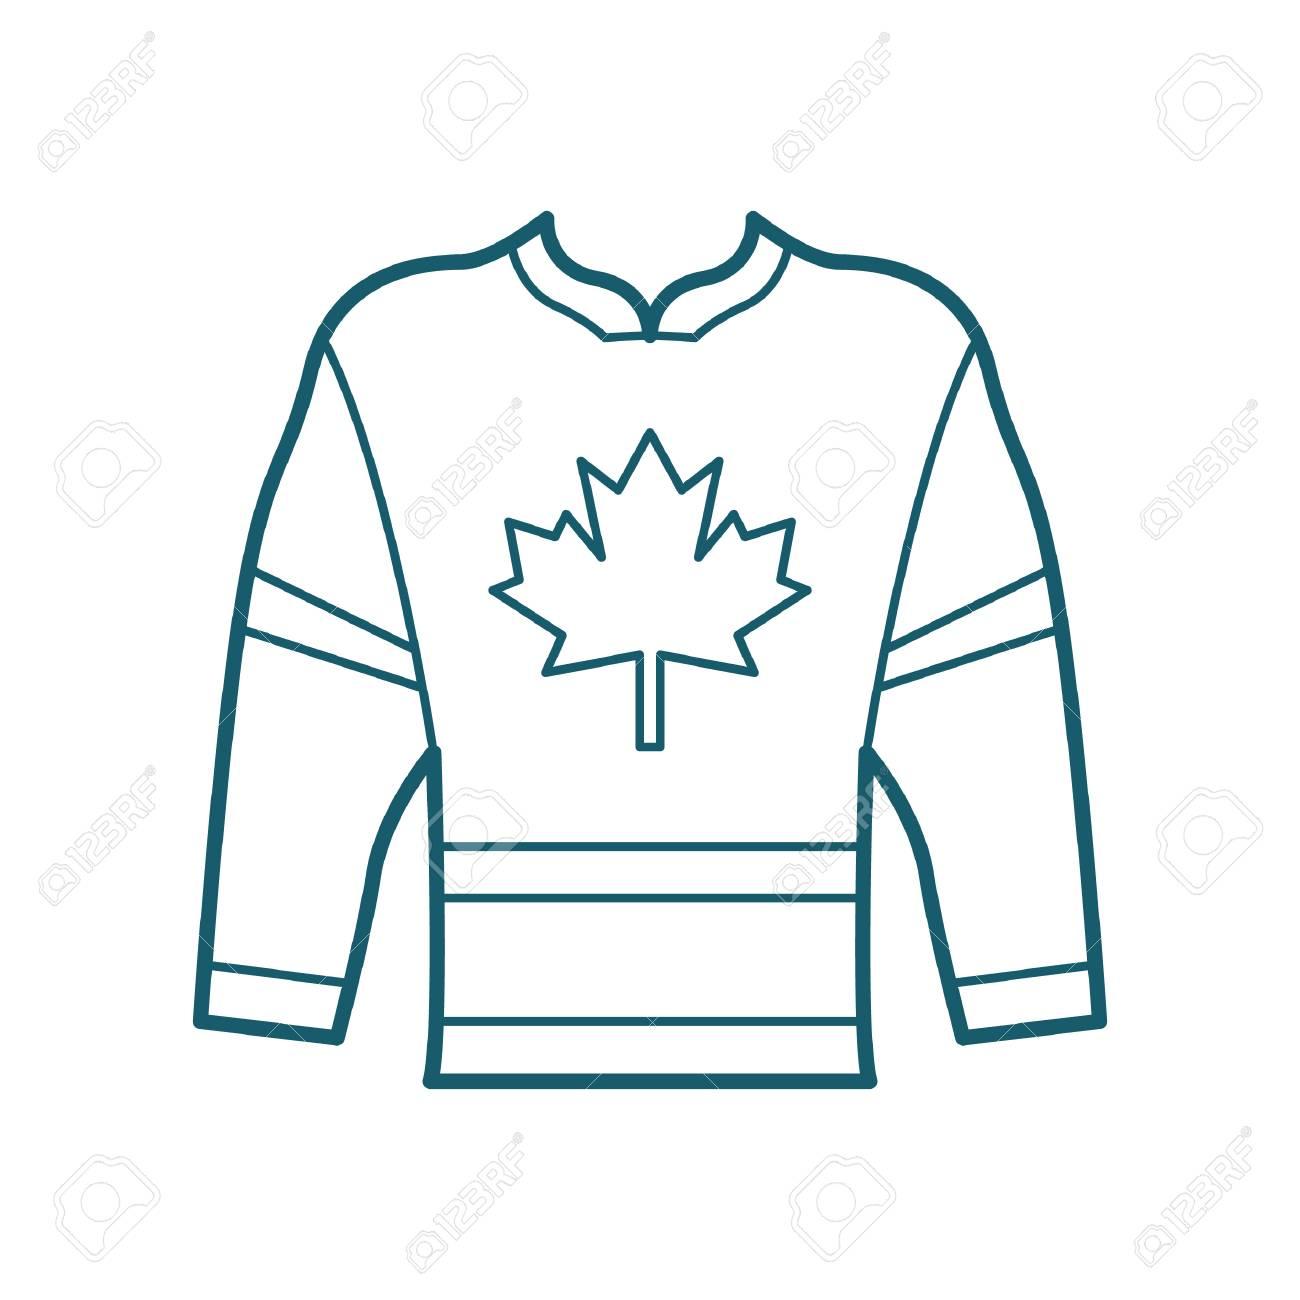 Hockey Jersey Royalty Free Cliparts Vectors And Stock Illustration